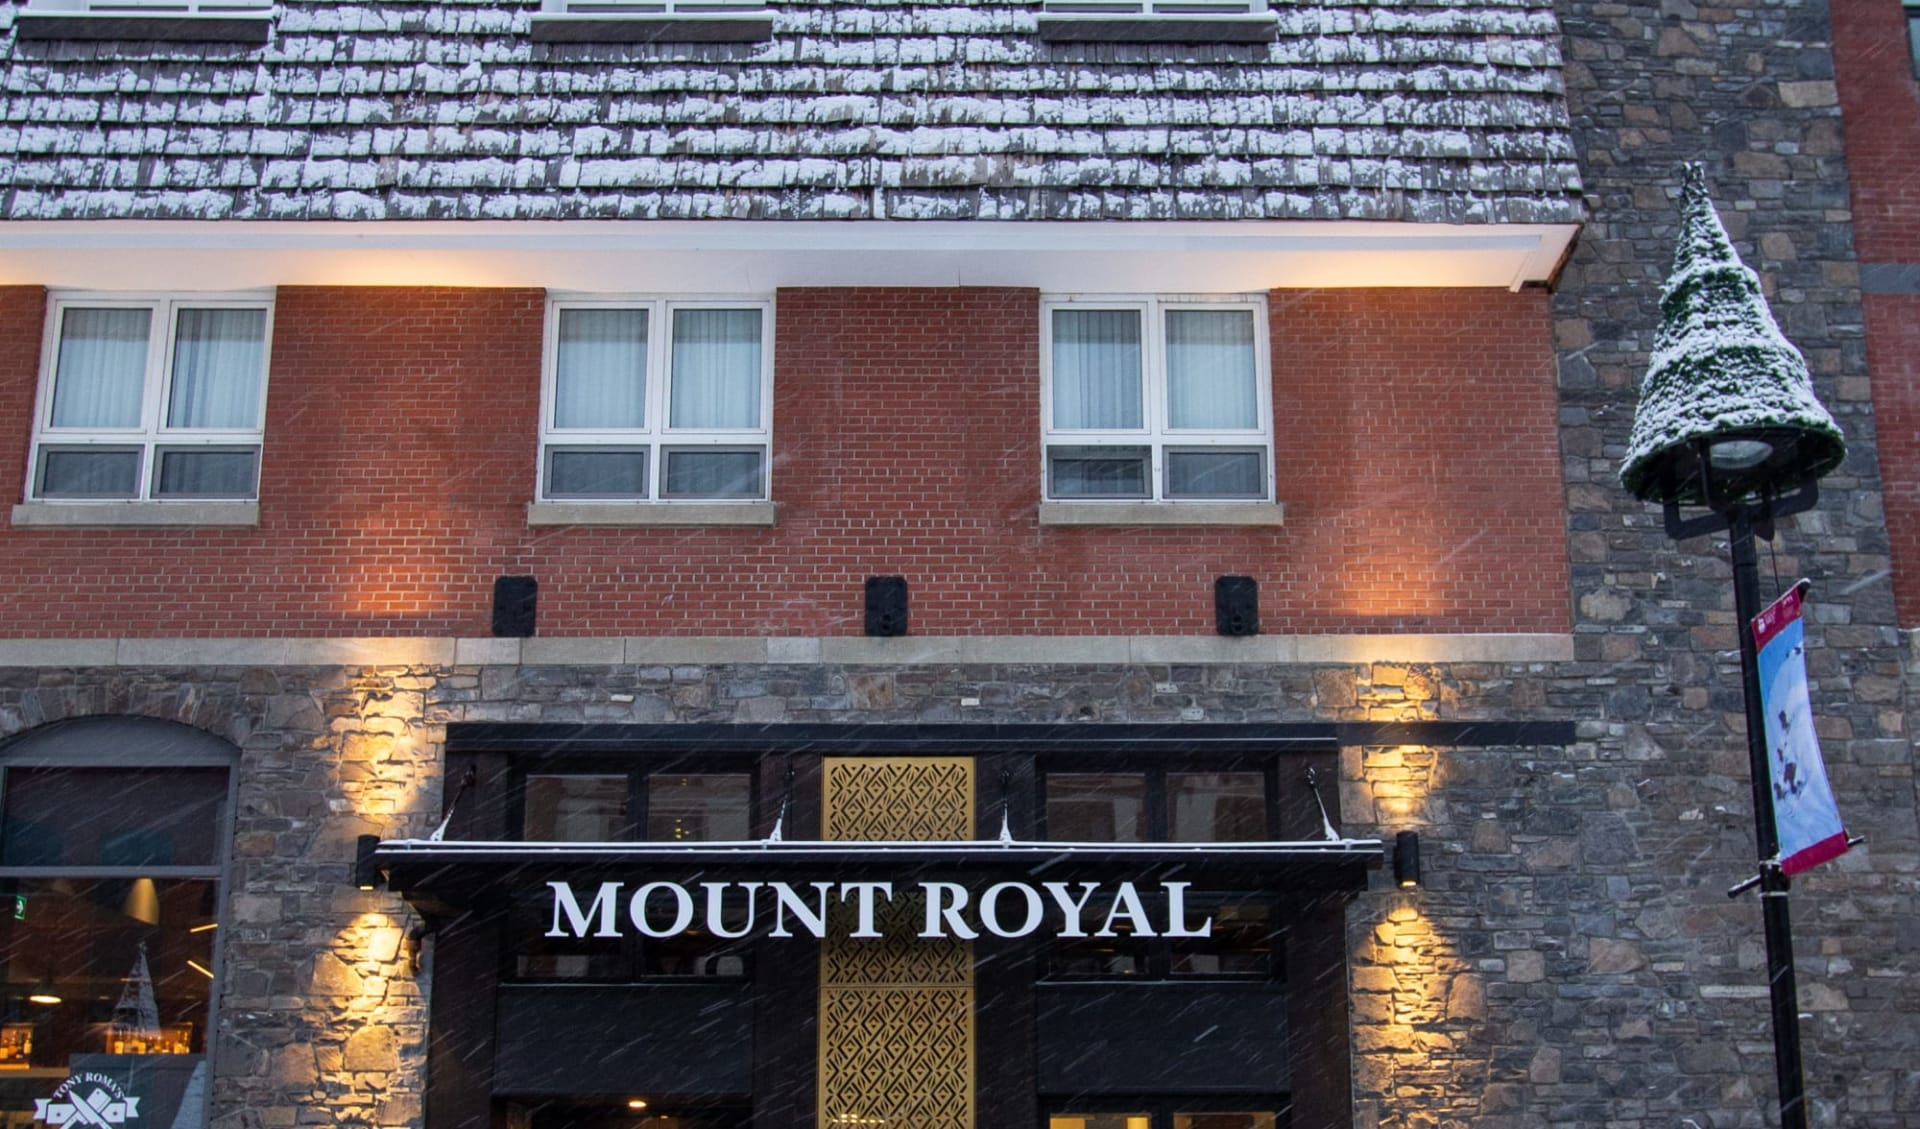 Mount Royal Hotel in Banff: Exterior_Banff Mount Royal Hotel_Aussenansicht 2_Jonview